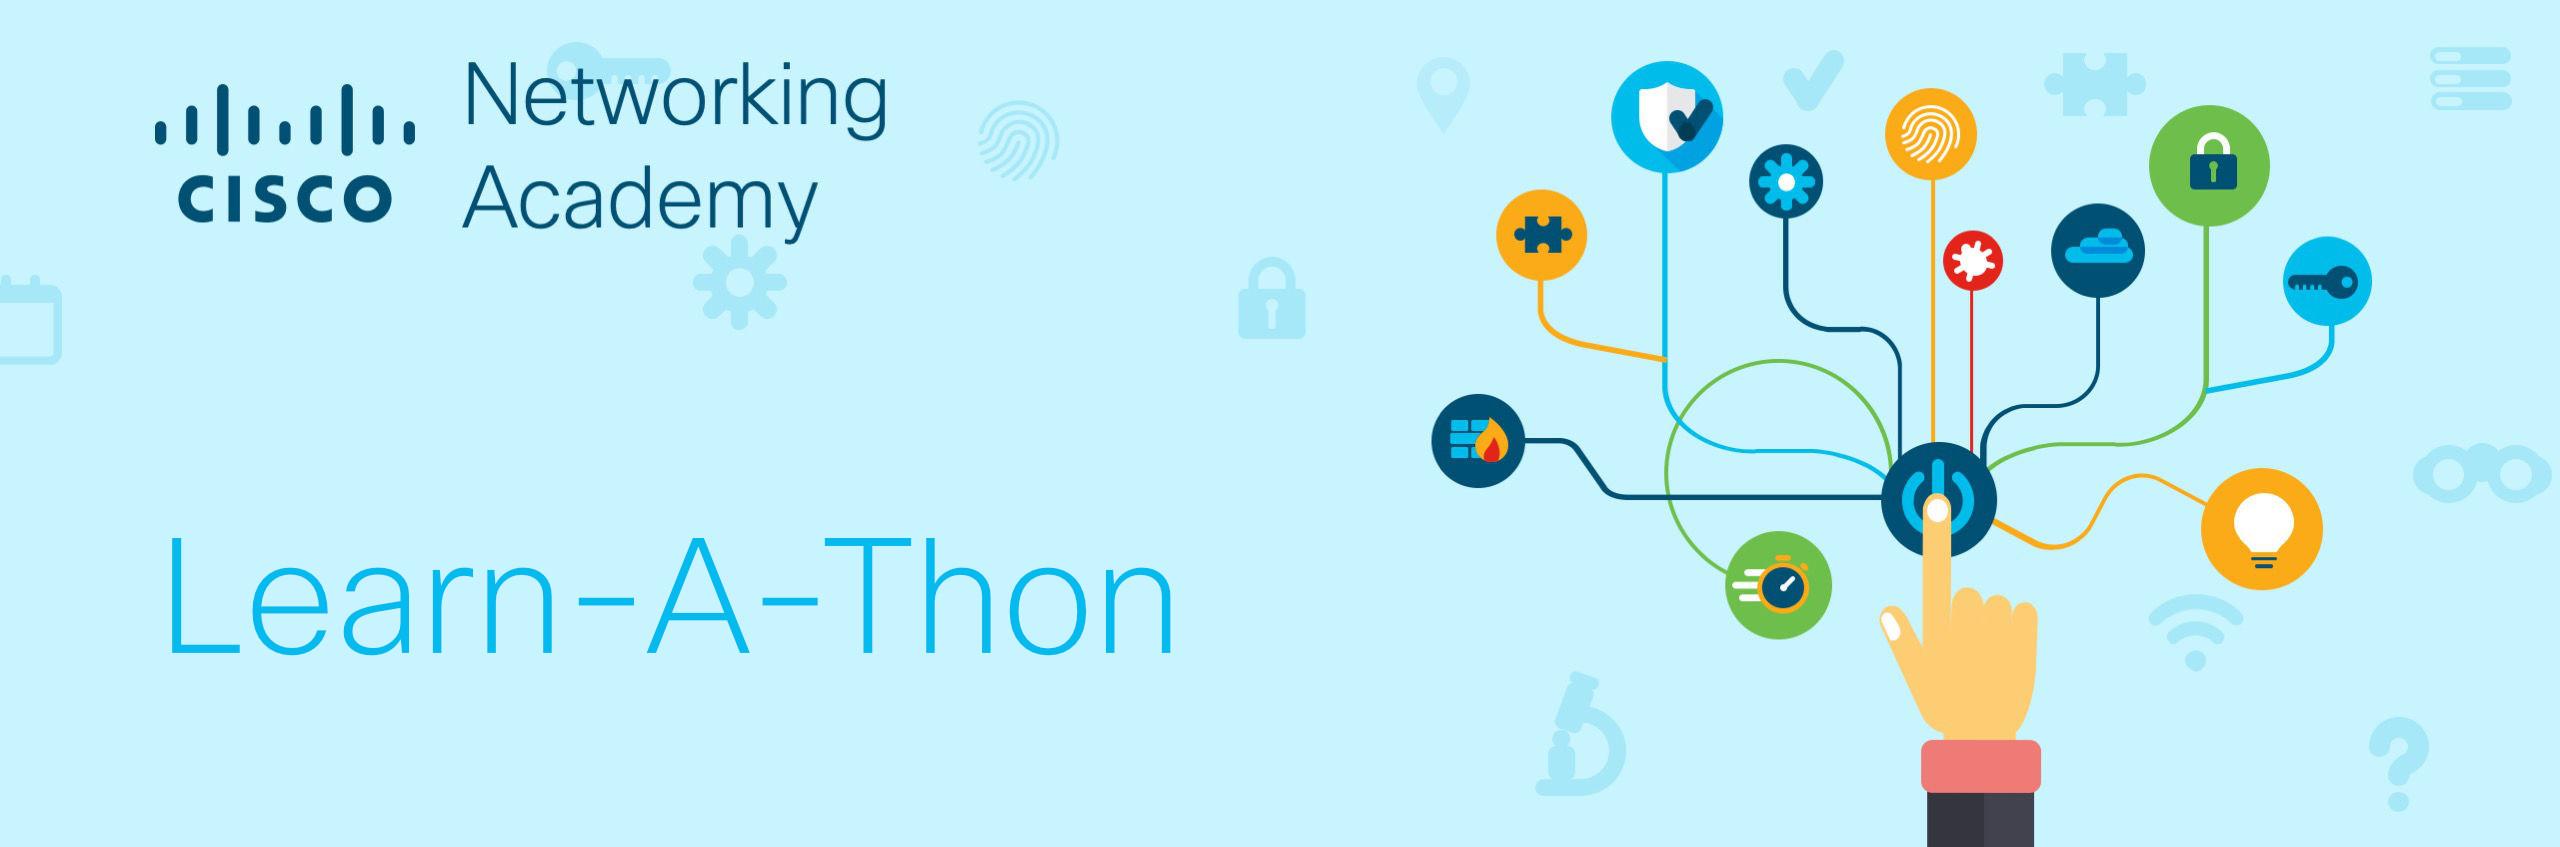 NetAcad Learn-A-Thon Banner 2020